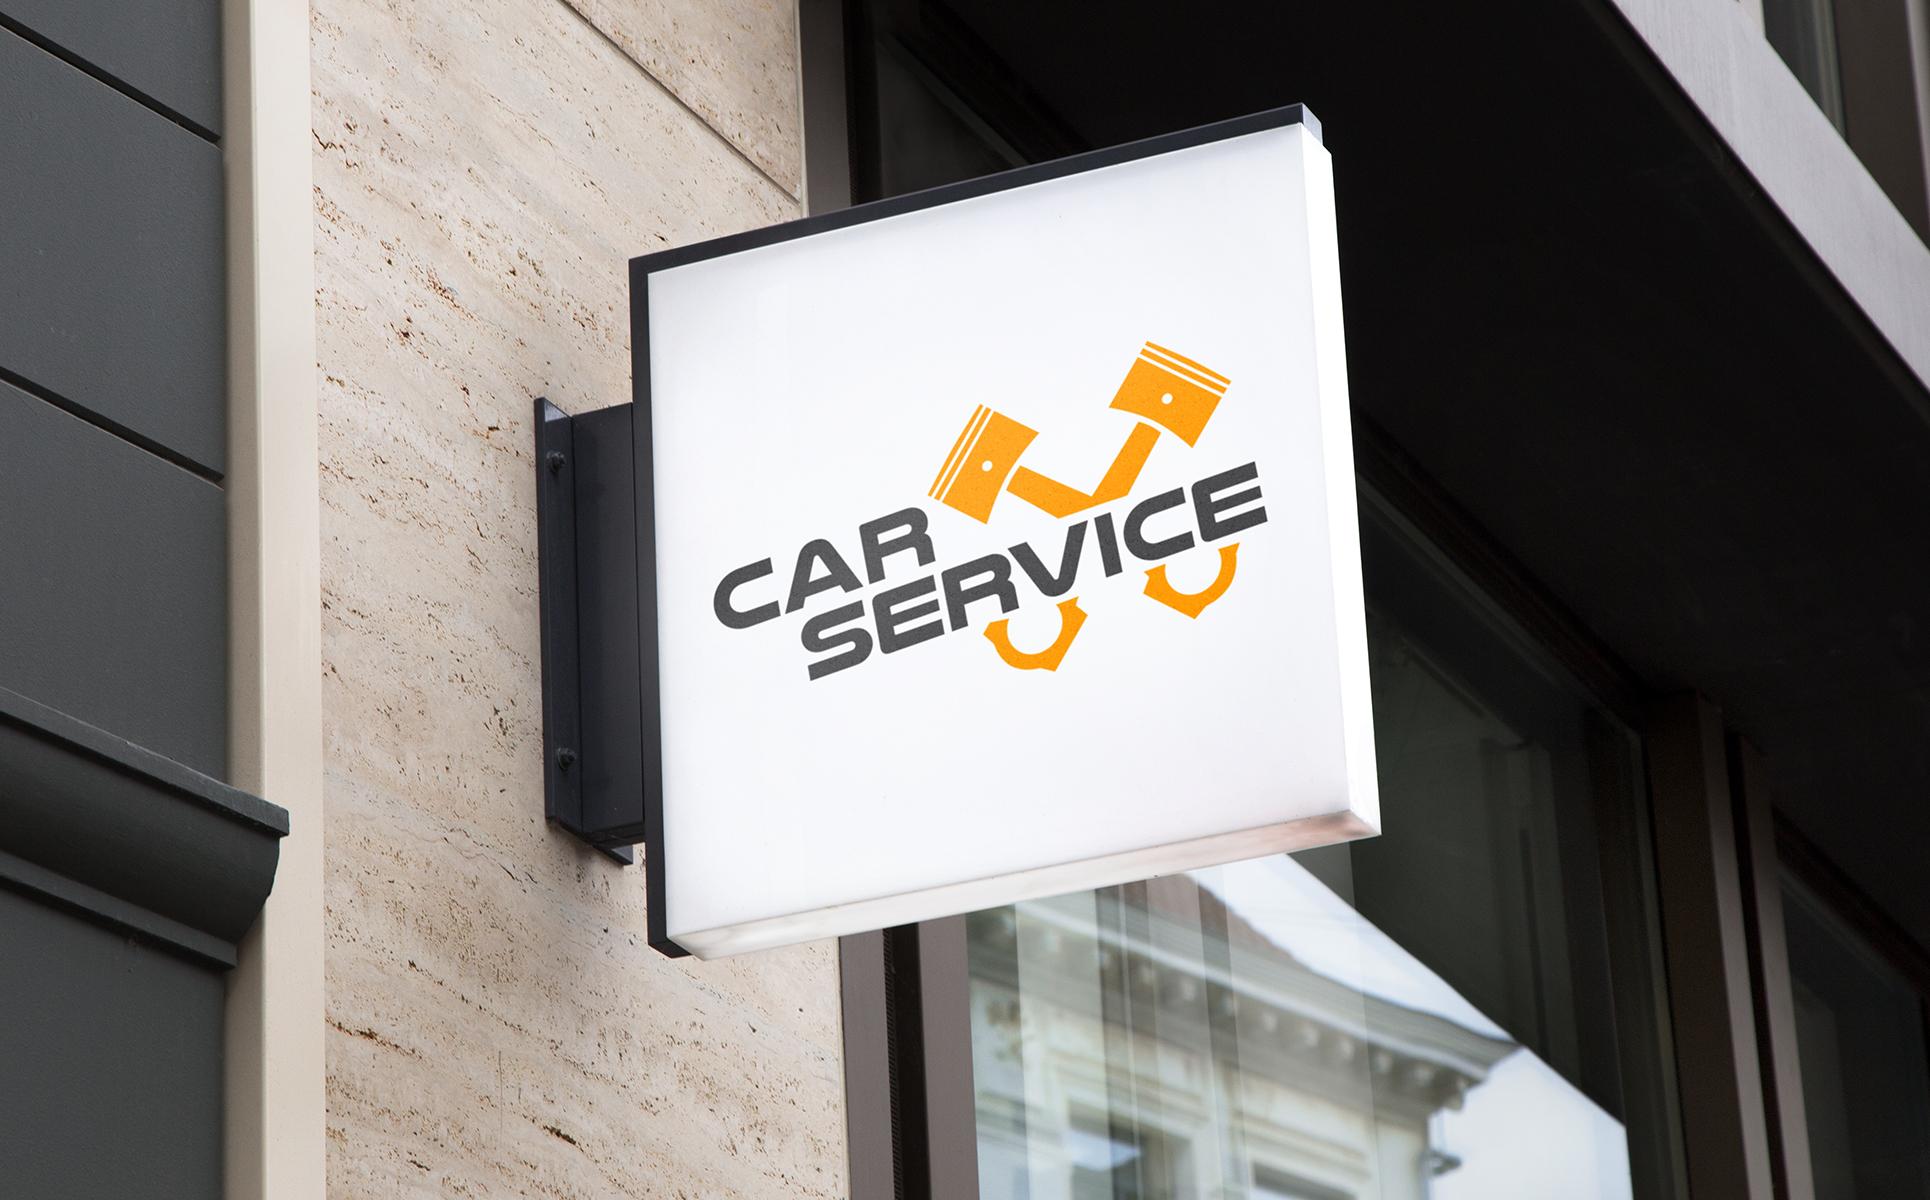 Plantilla de Logotipo #65598 para Sitio de Reparación de coches